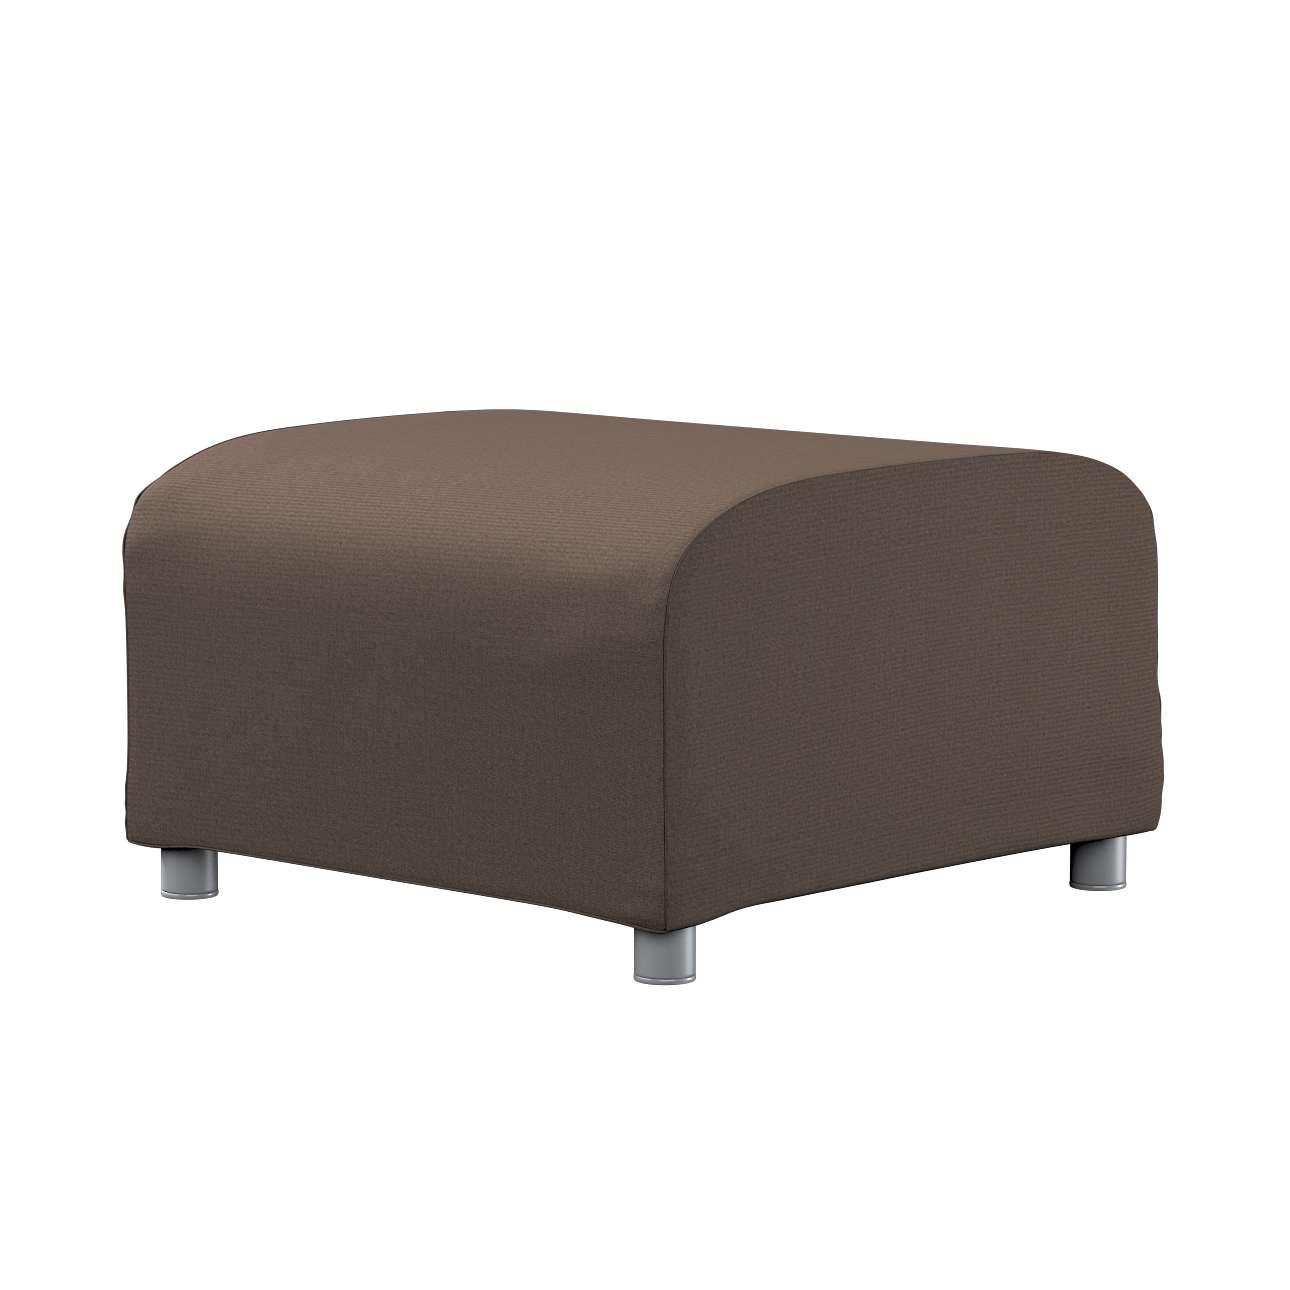 KLIPPAN pufo užvalkalas Klippan footstool cover kolekcijoje Etna , audinys: 705-08